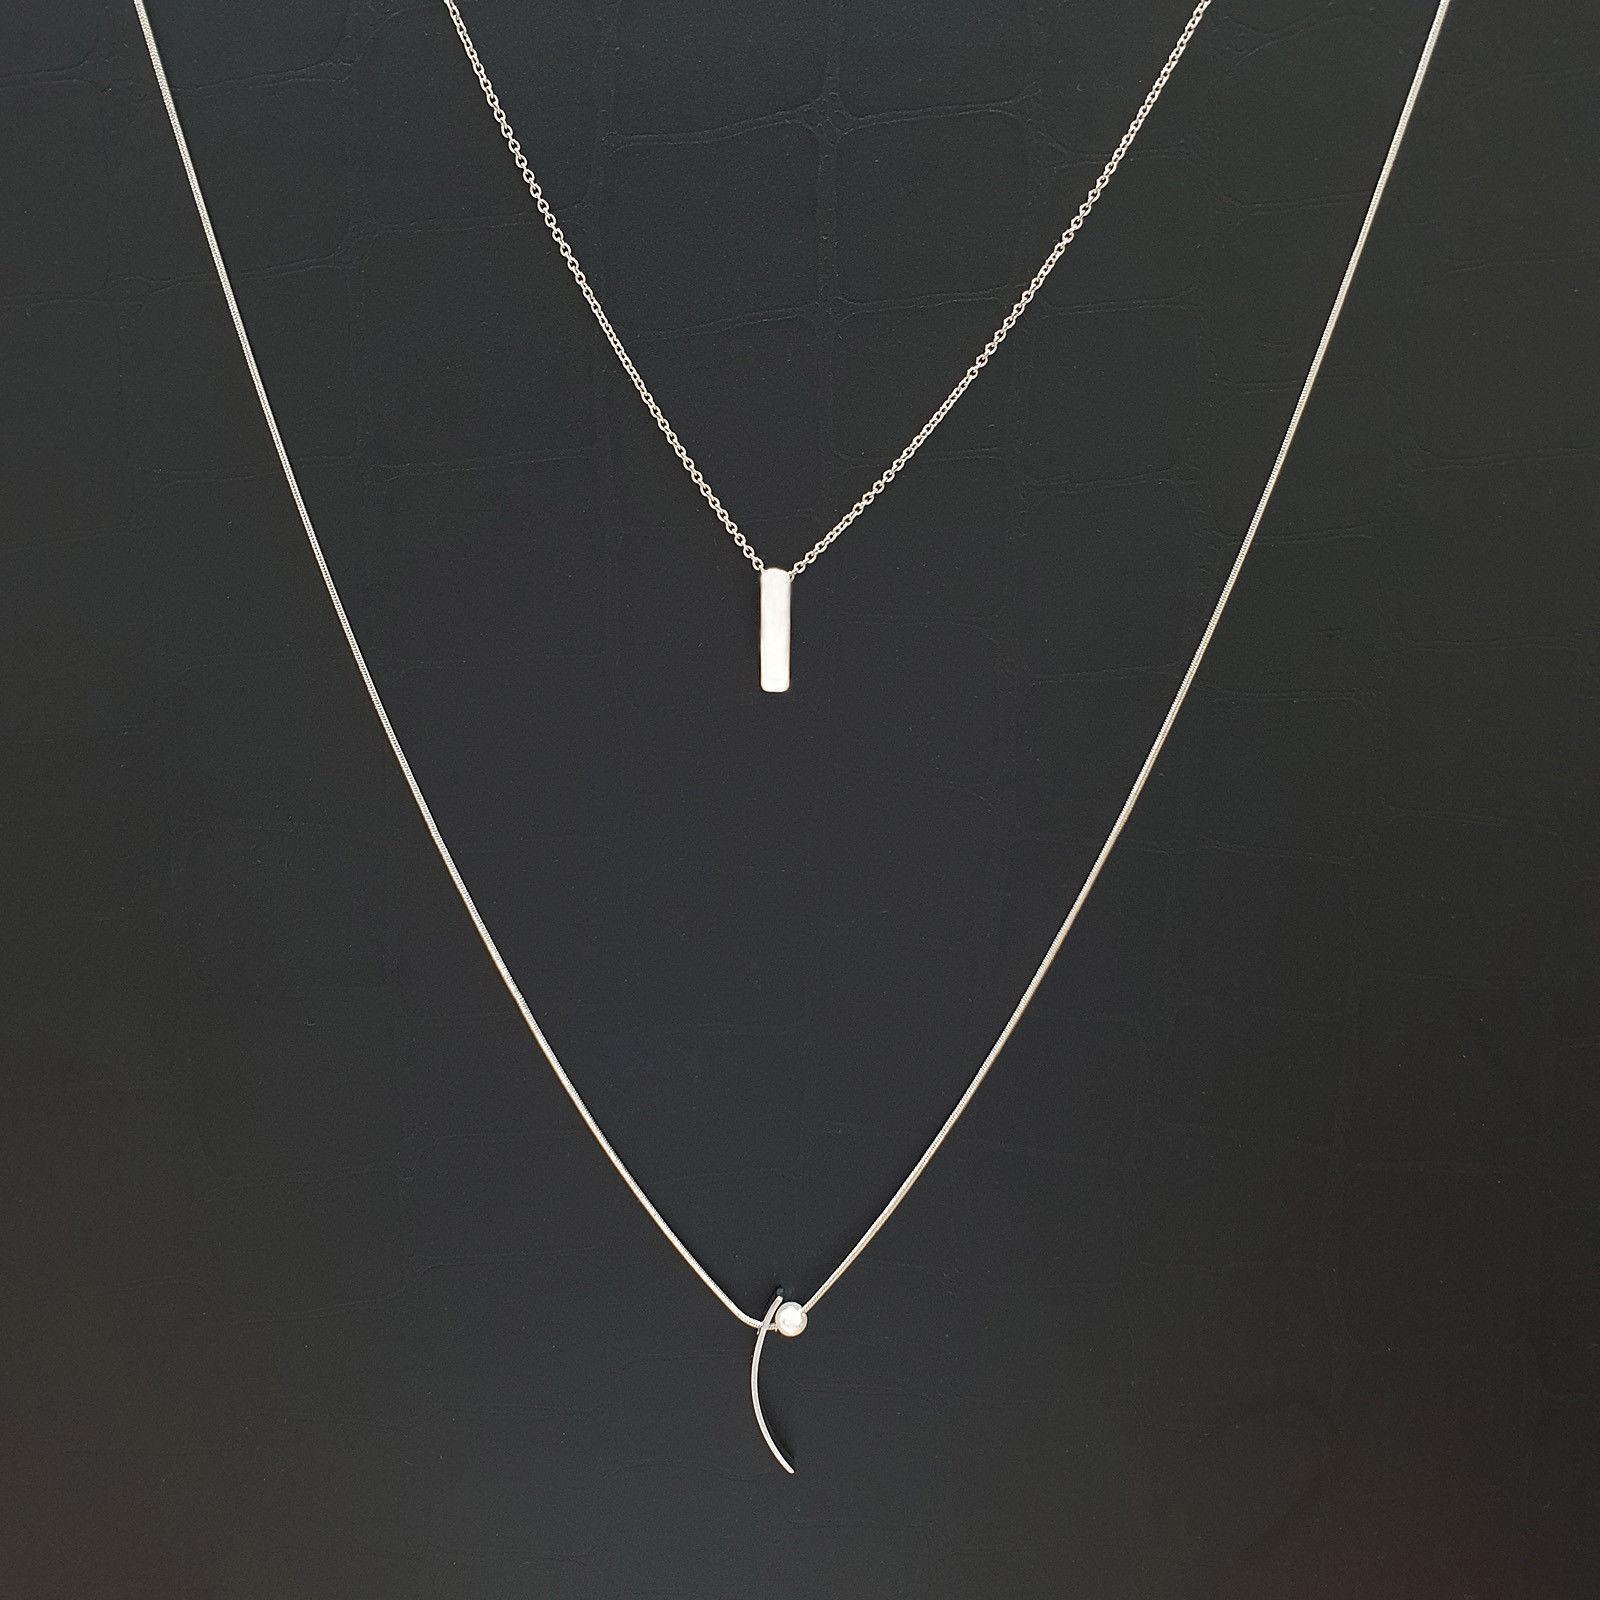 Multi-Strand Curved Bar Princess Layered Necklace Imitation Pearl N18